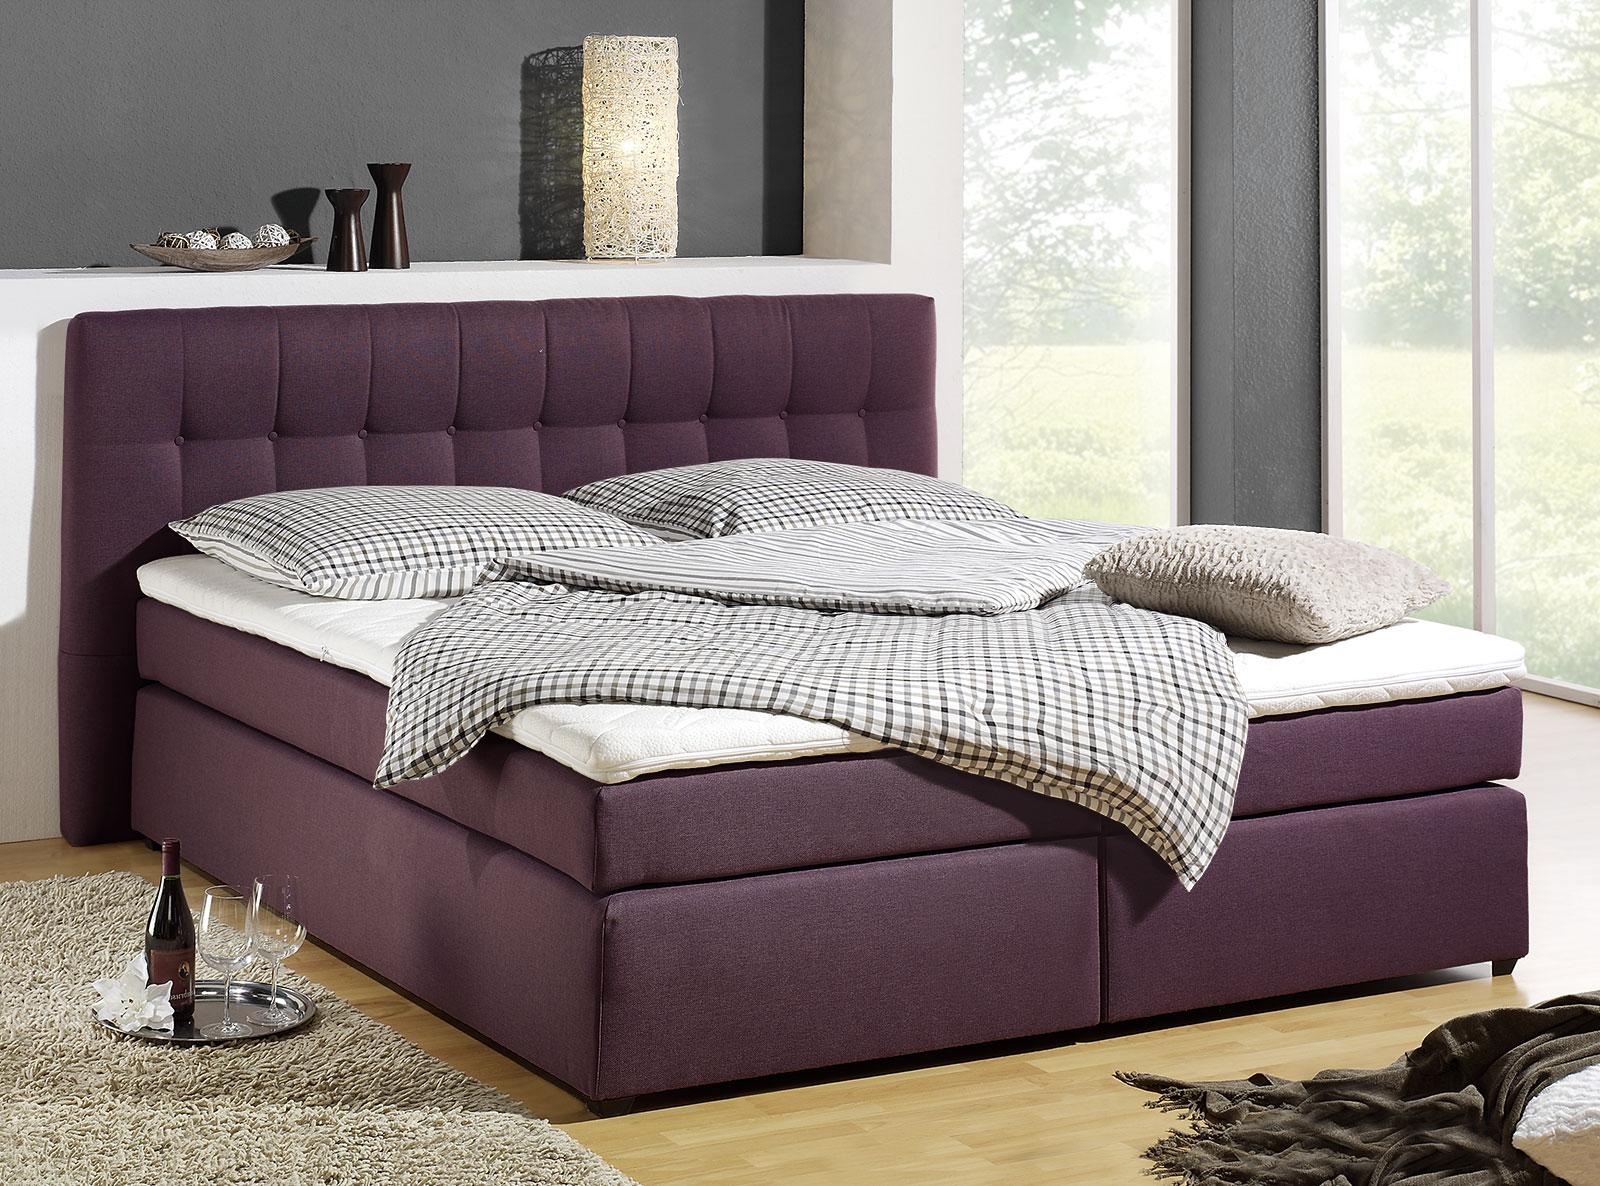 boxspringbett in h3 bis 120kg k rpergewicht chicago. Black Bedroom Furniture Sets. Home Design Ideas